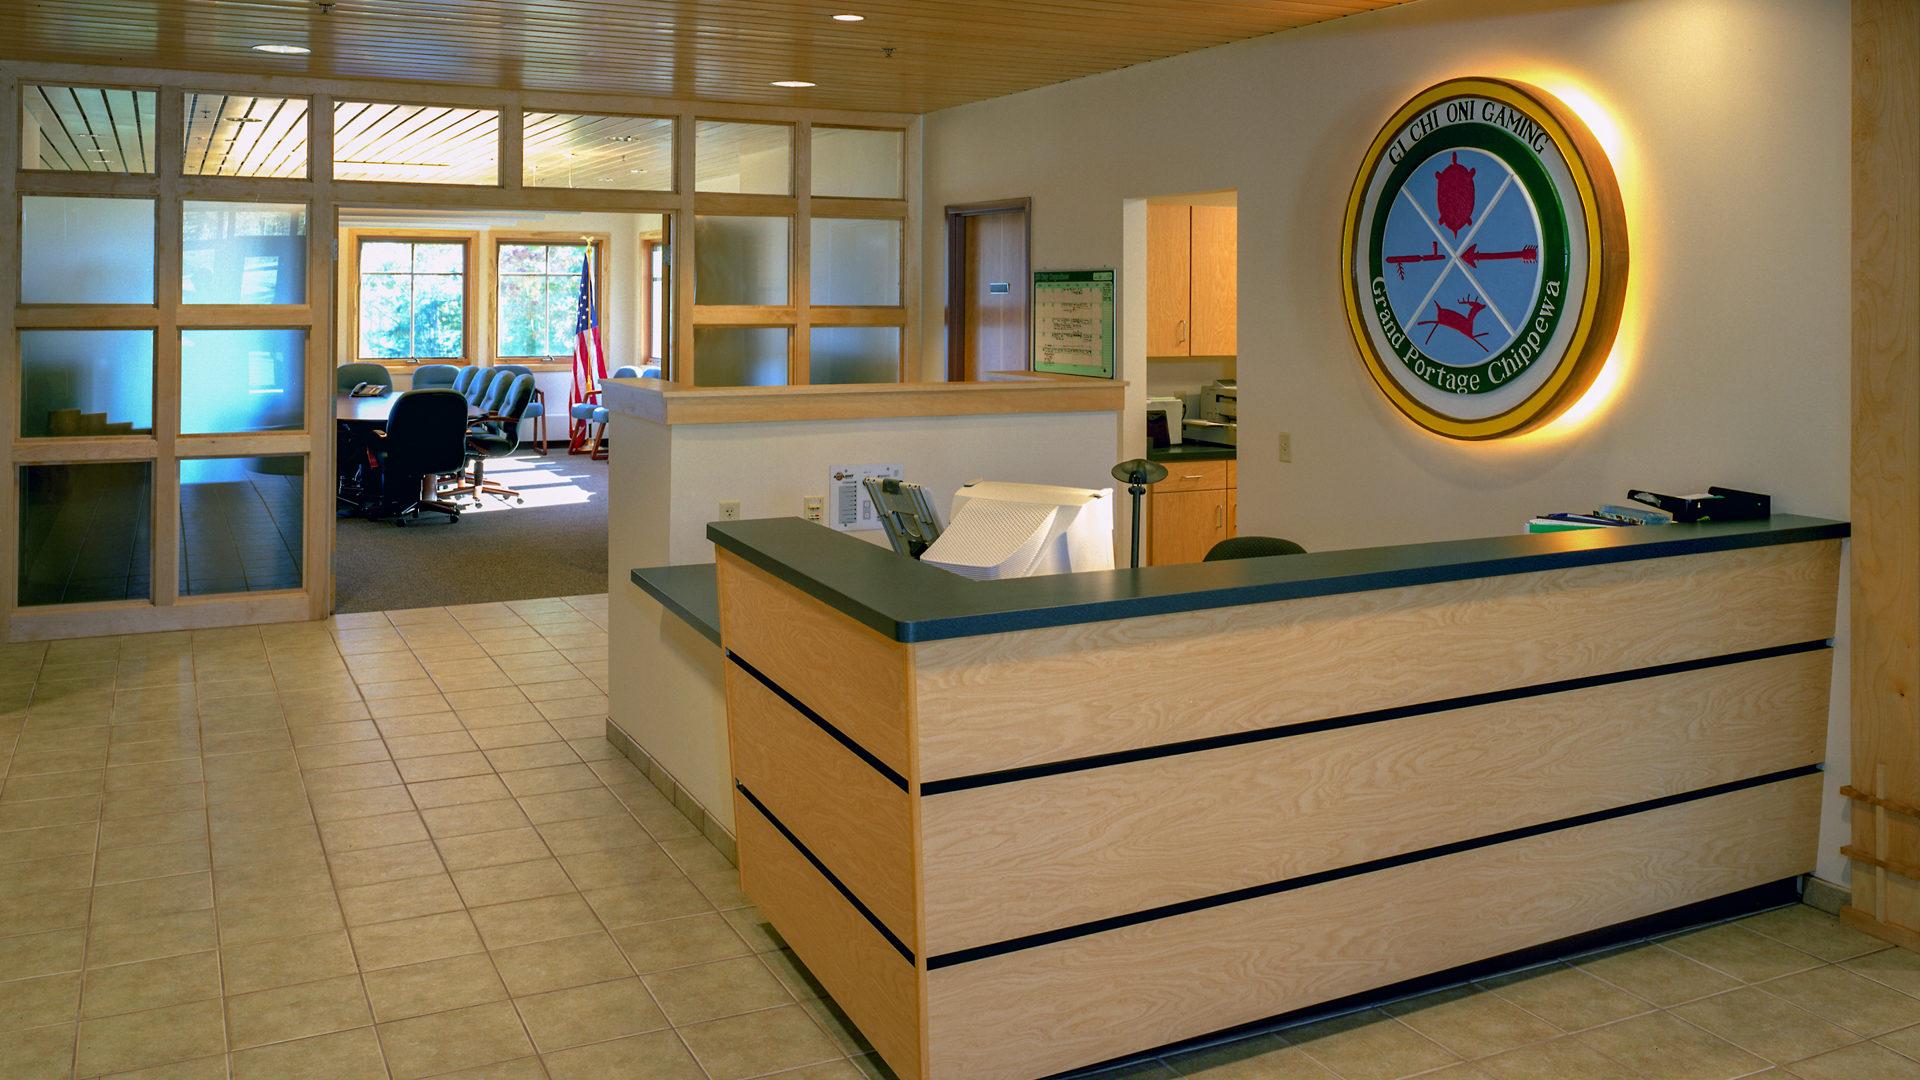 Grand Portage Tribal Office Grand Marais Interior Reception Desk